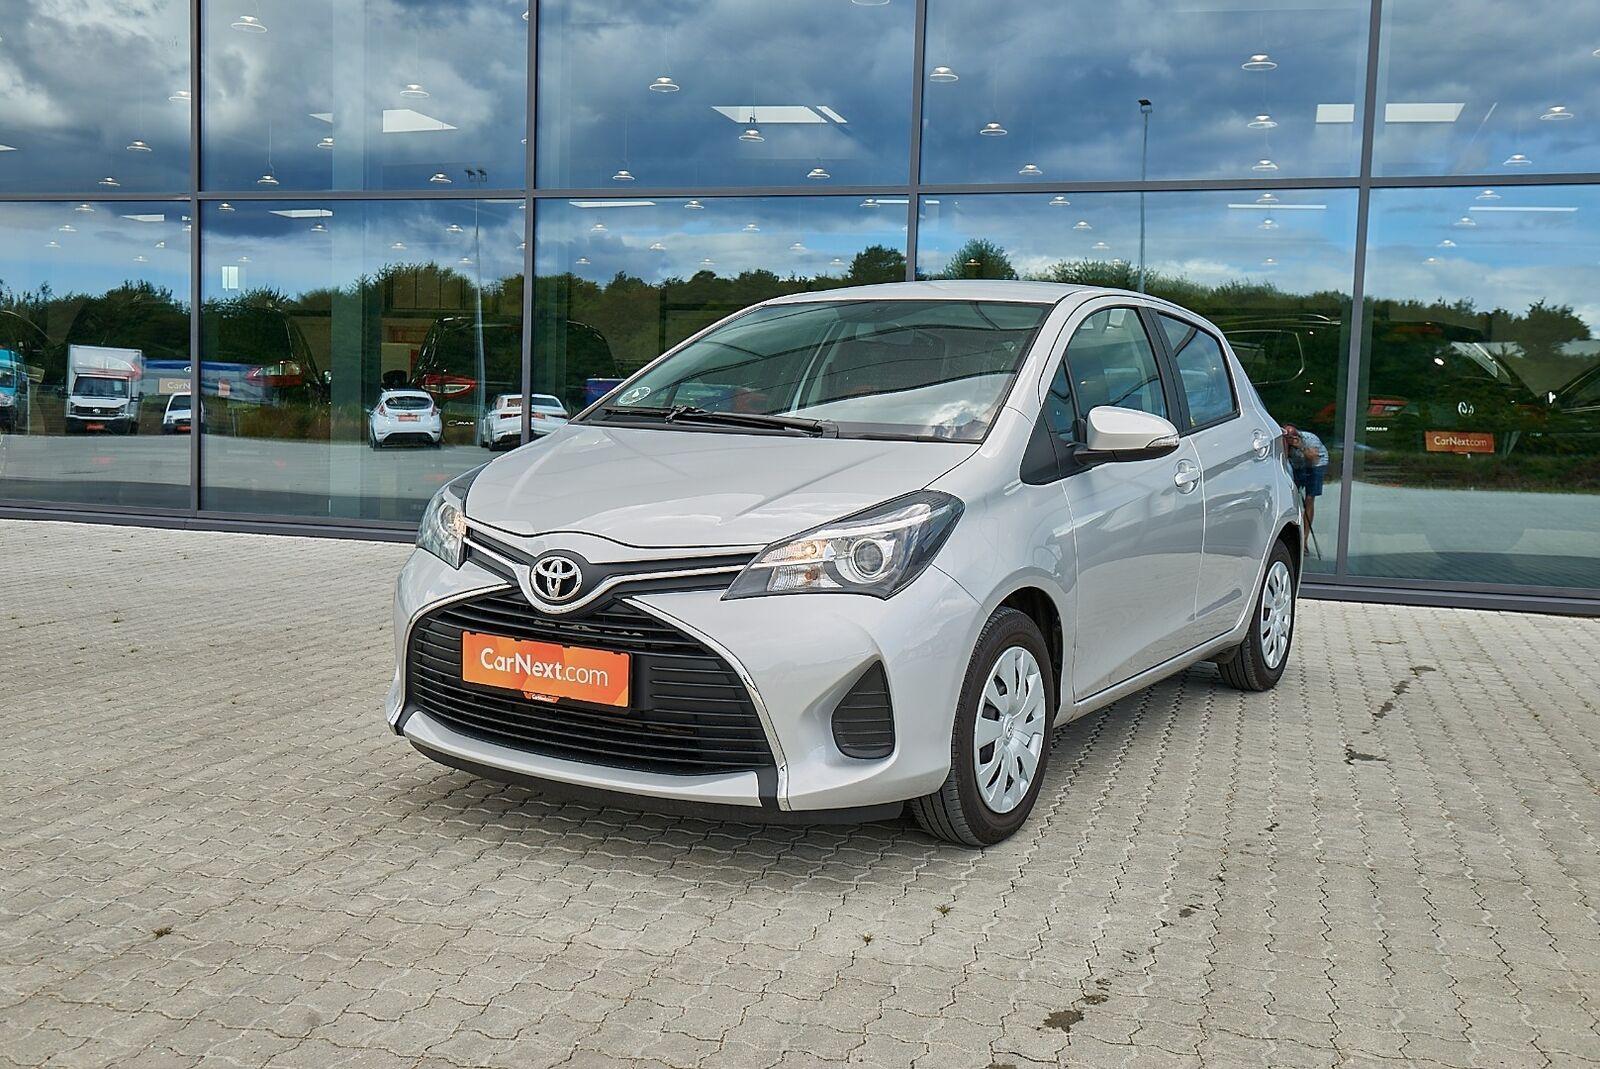 Toyota Yaris 1,0 VVT-i T2 5d - 75.900 kr.